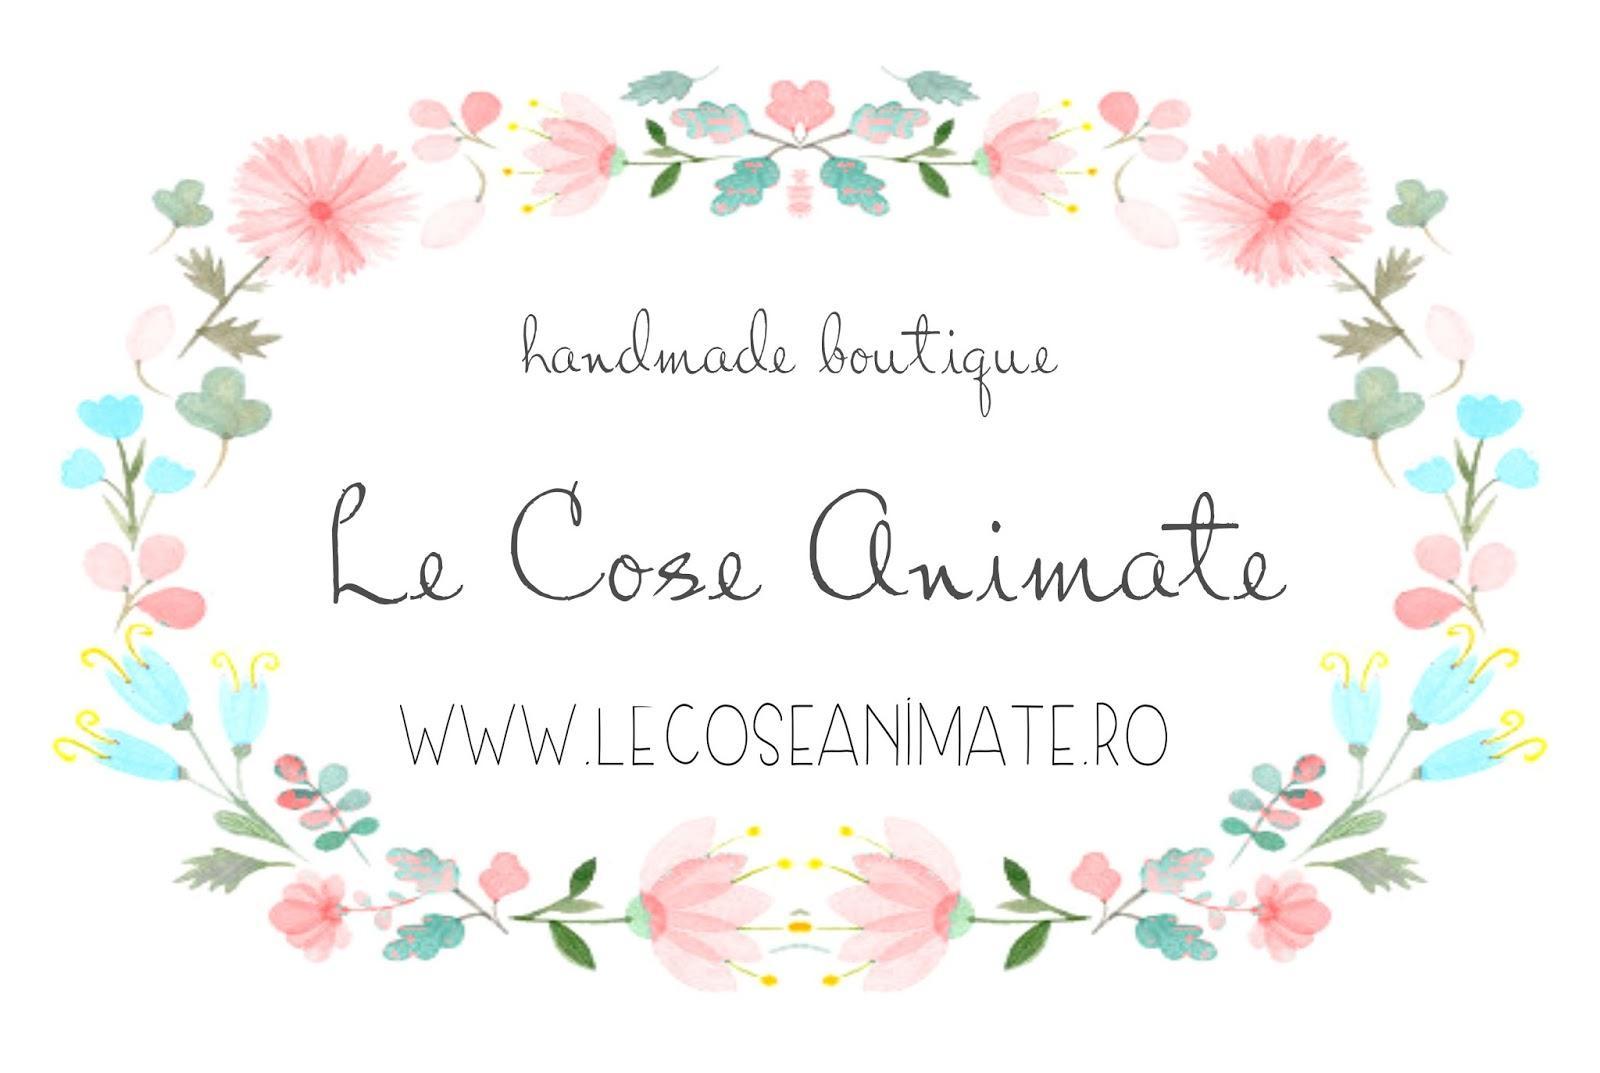 www.lecoseanimate.ro